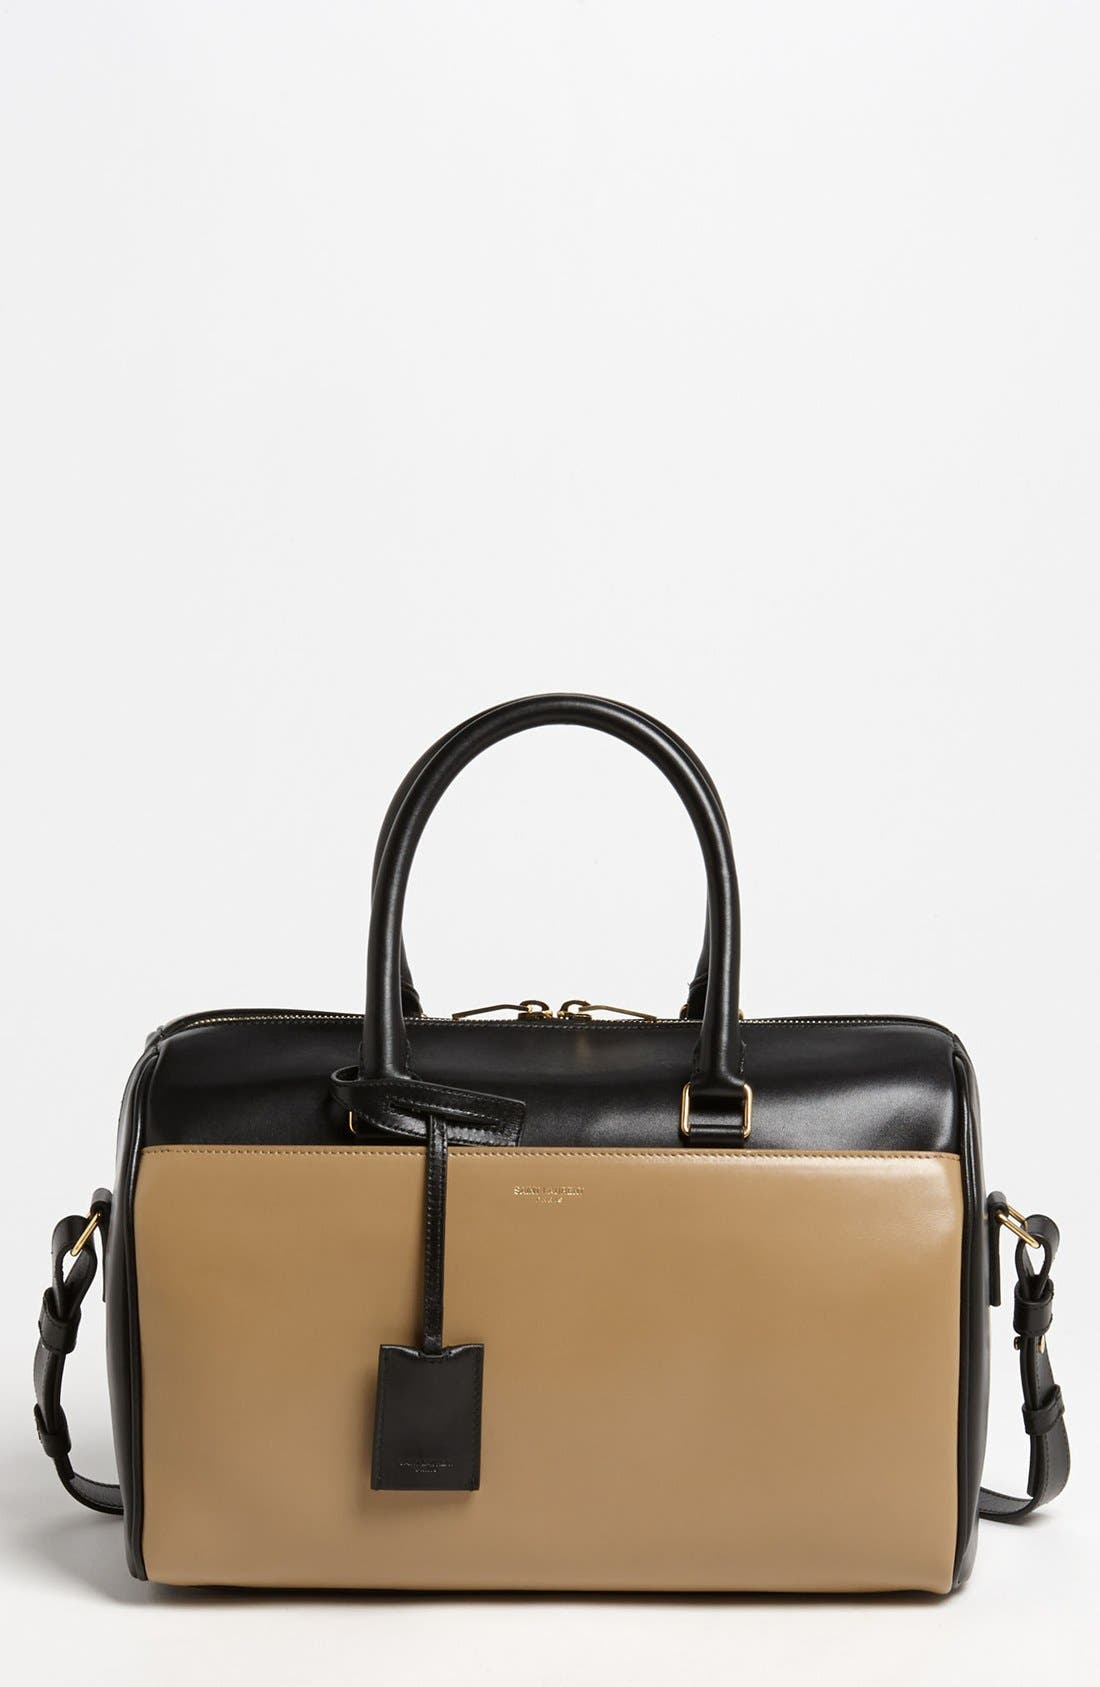 Alternate Image 1 Selected - Saint Laurent 'Duffel 6' Leather Satchel